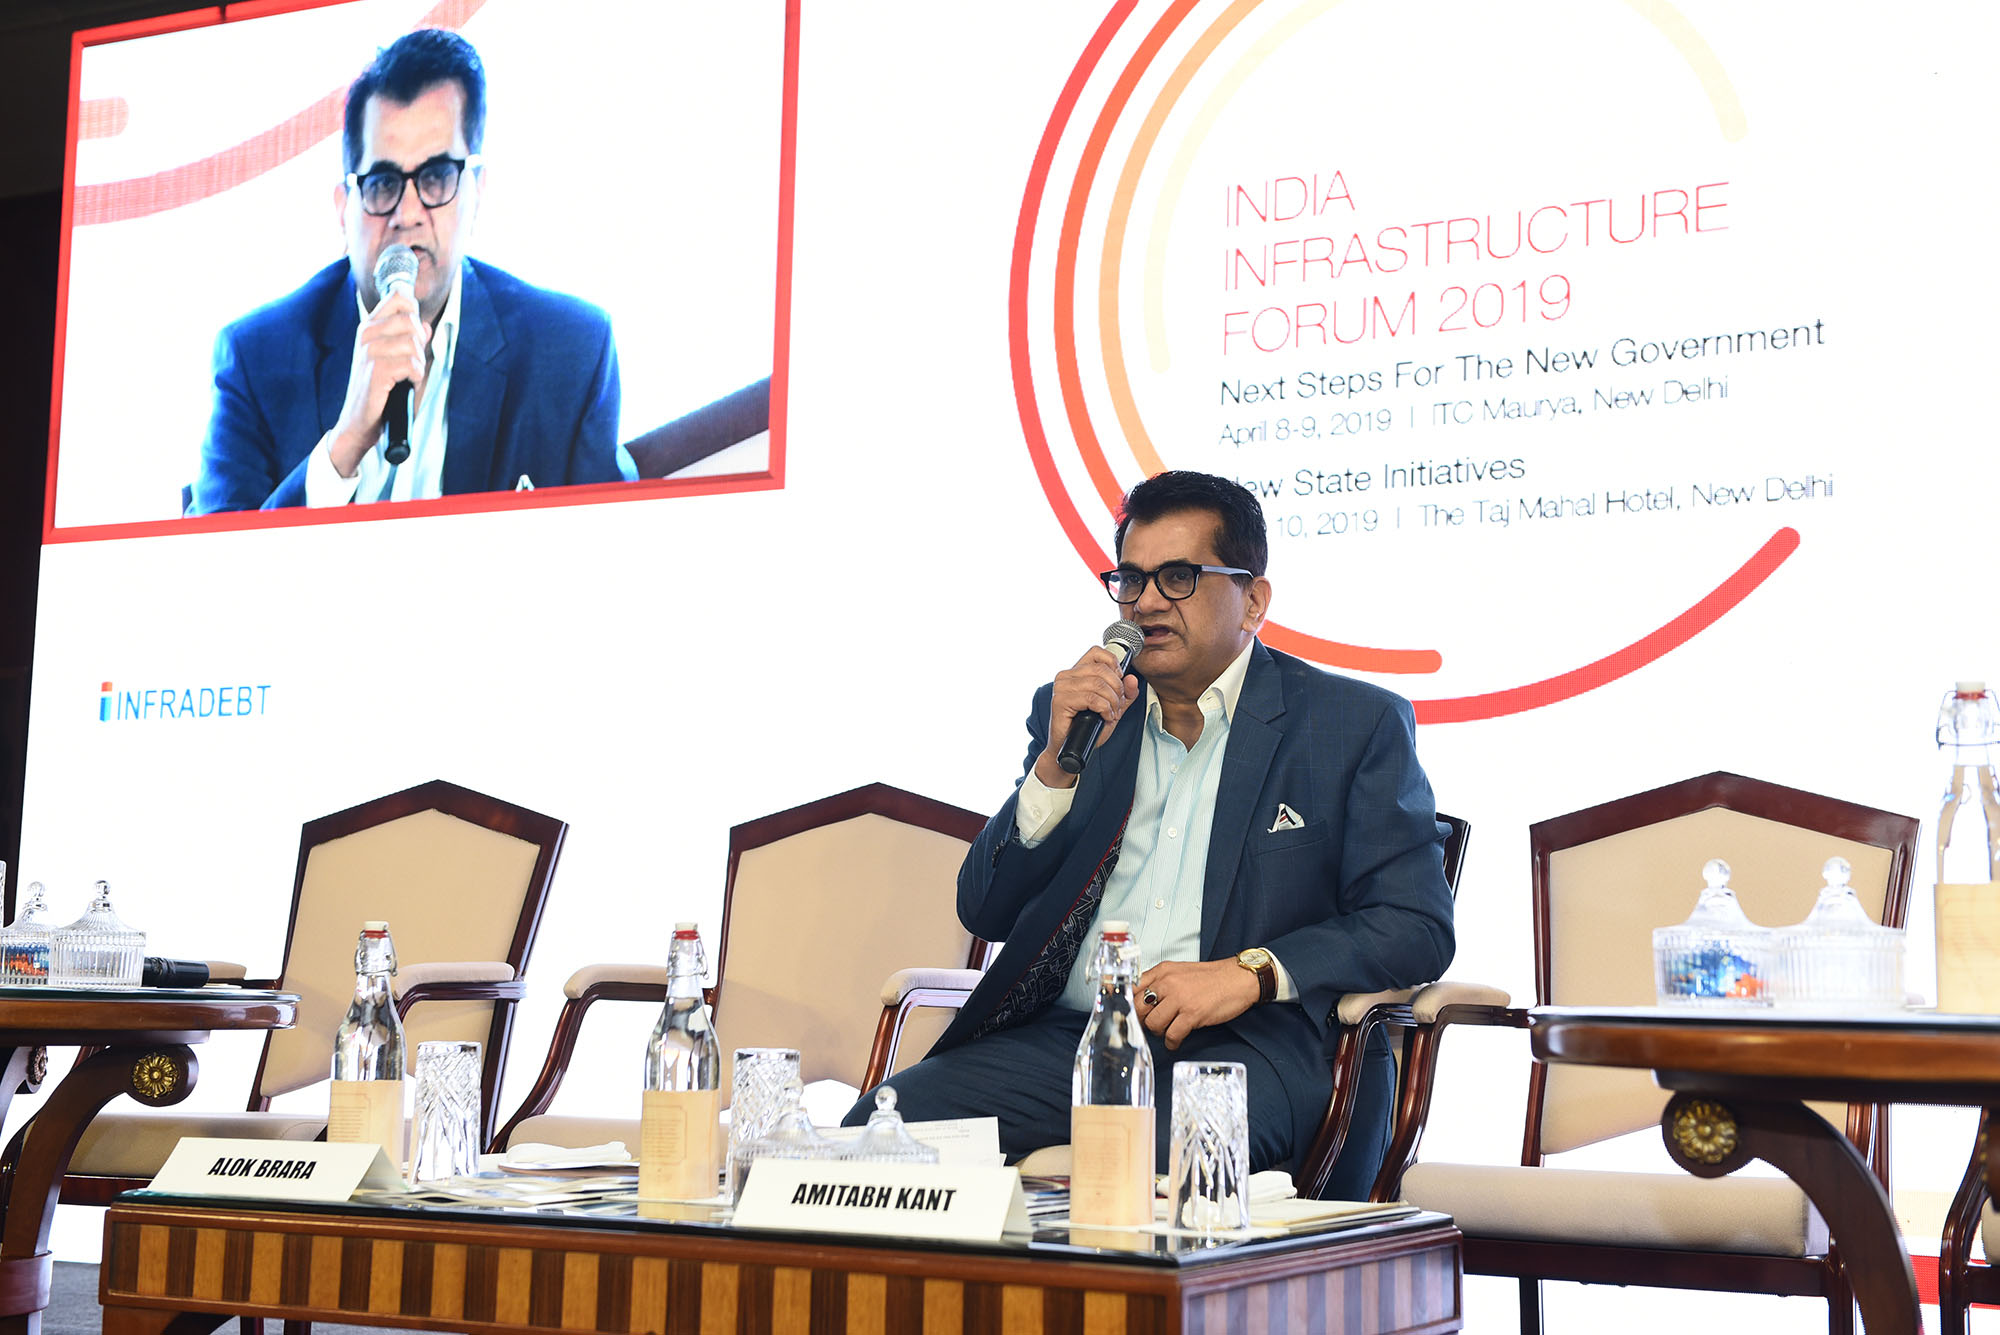 India Infrastructure Forum 2019